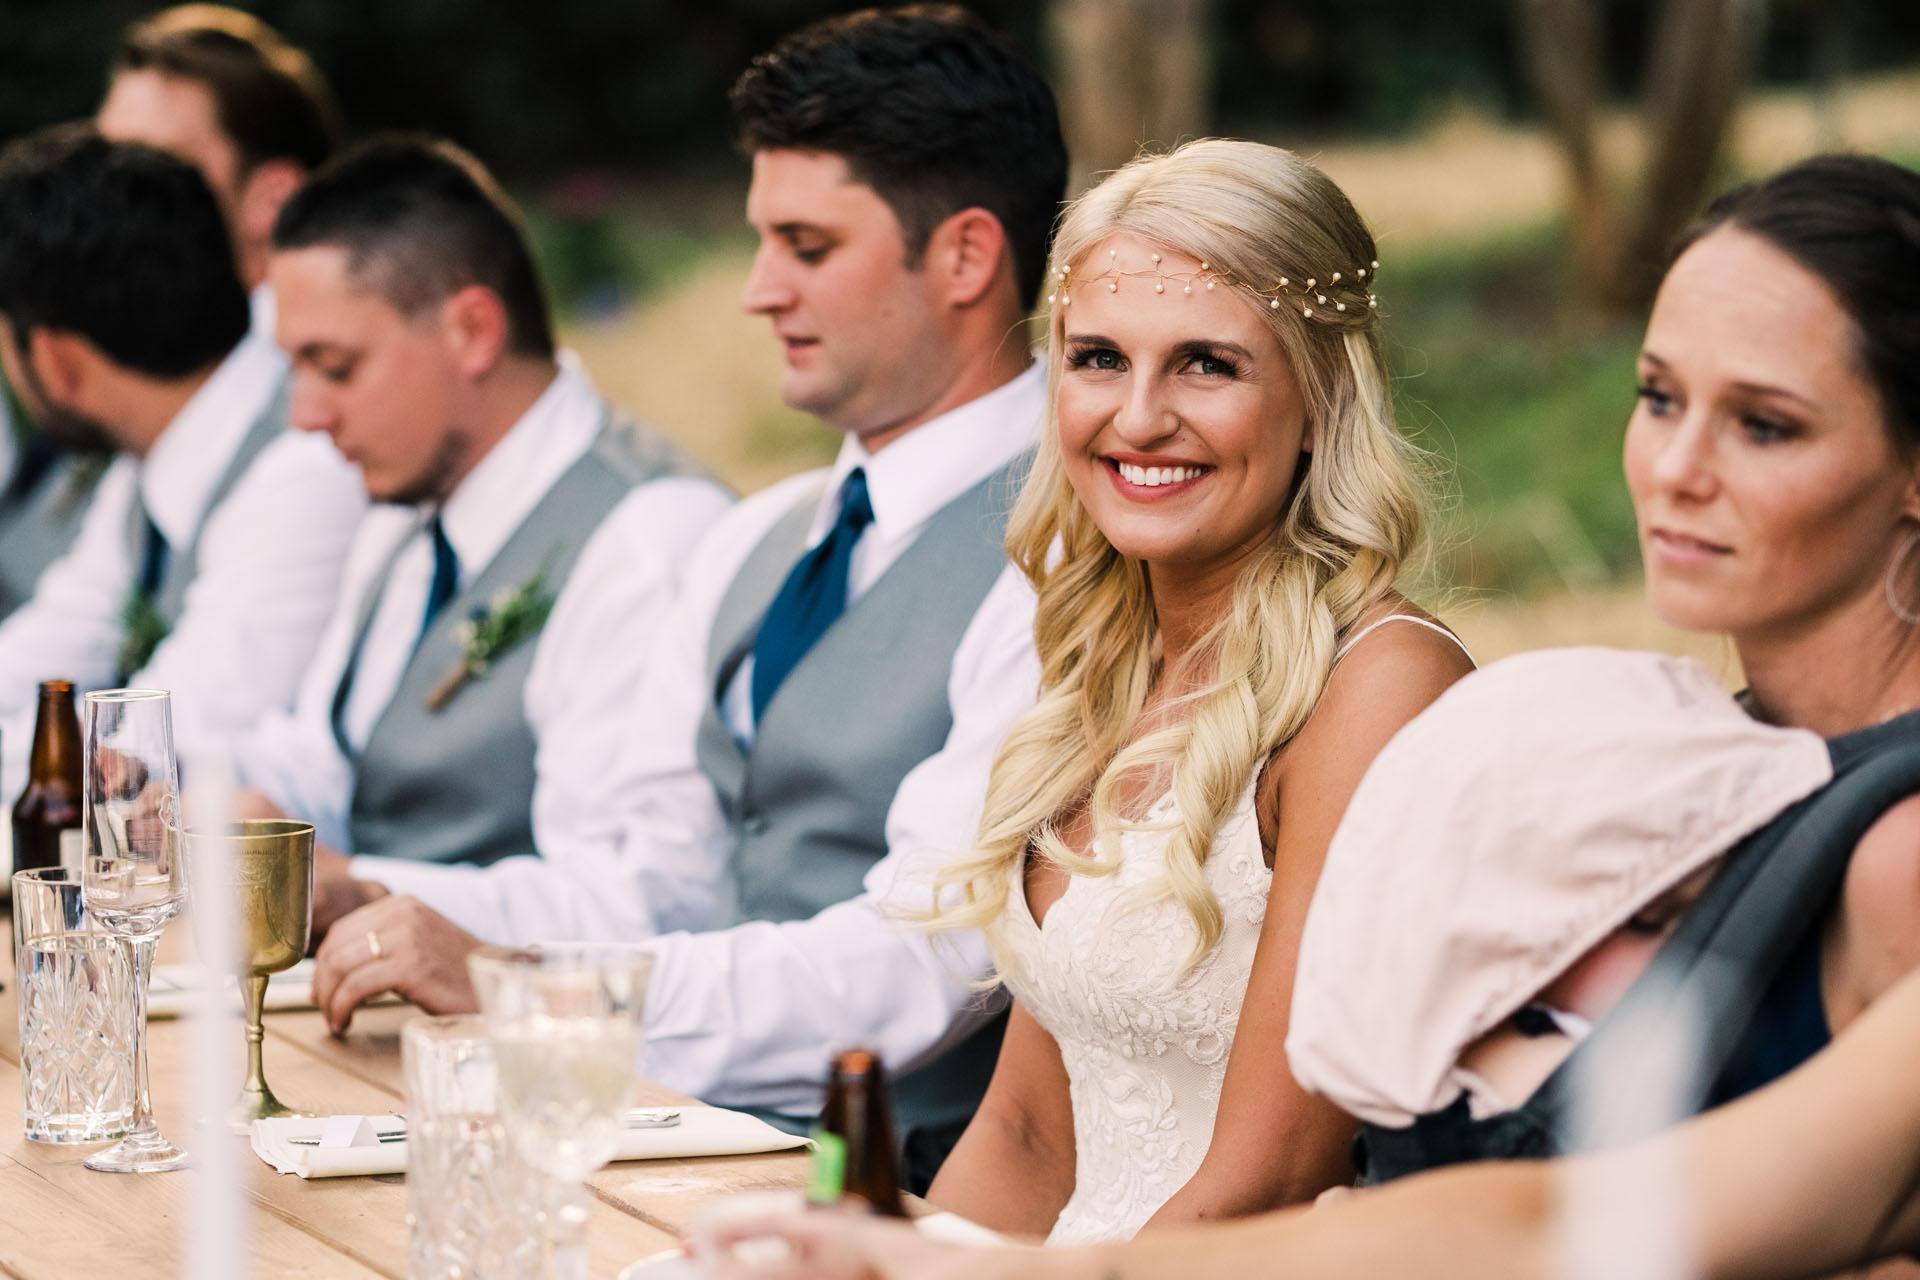 10-7-17 Devon and Jordan's Wedding-144.jpg